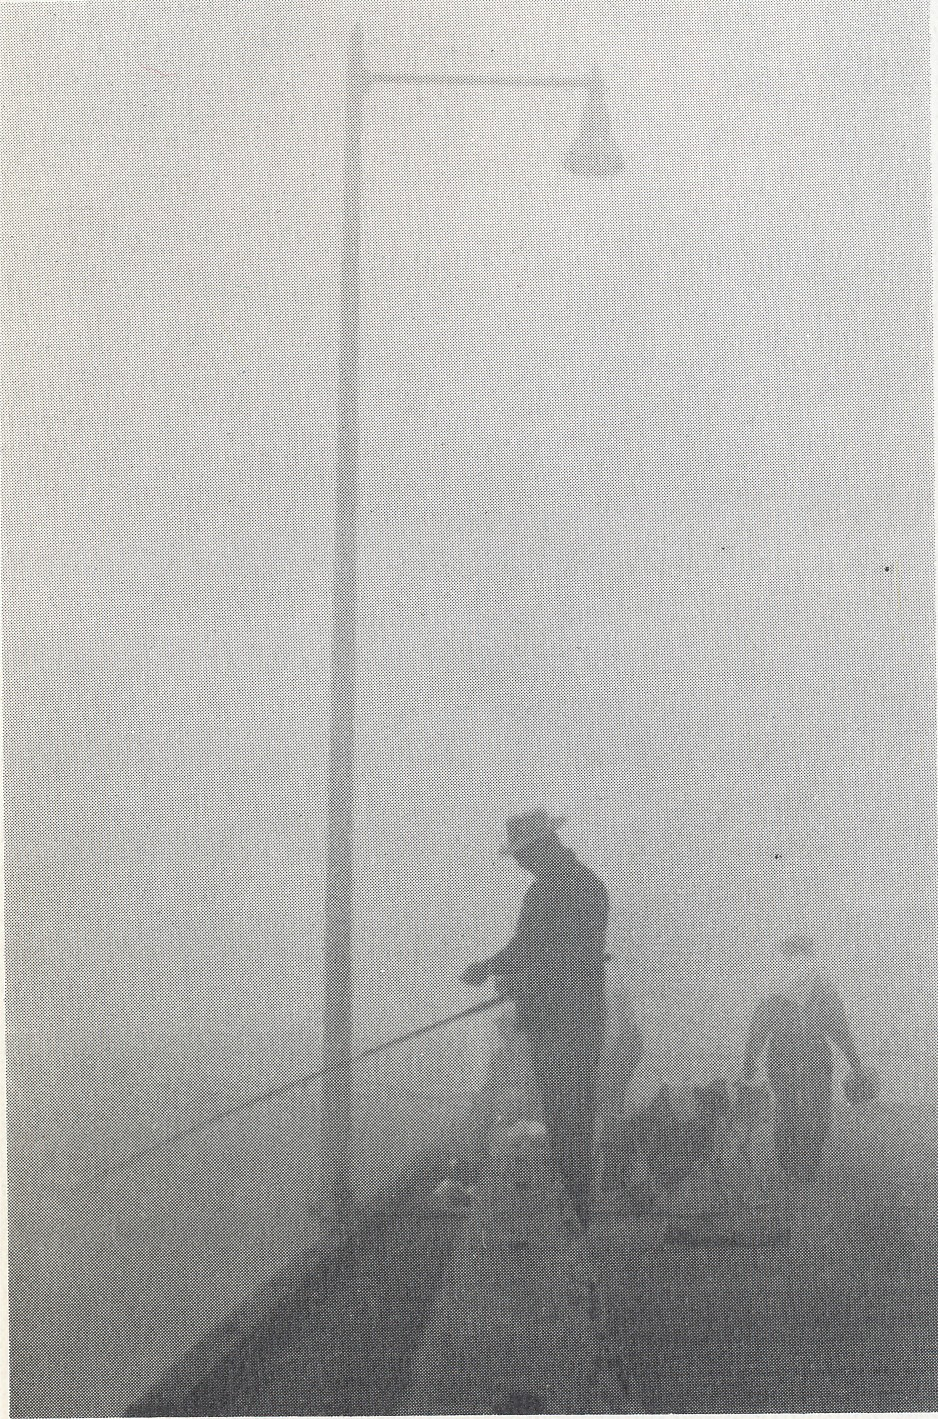 Newport_Pier_1962_1b